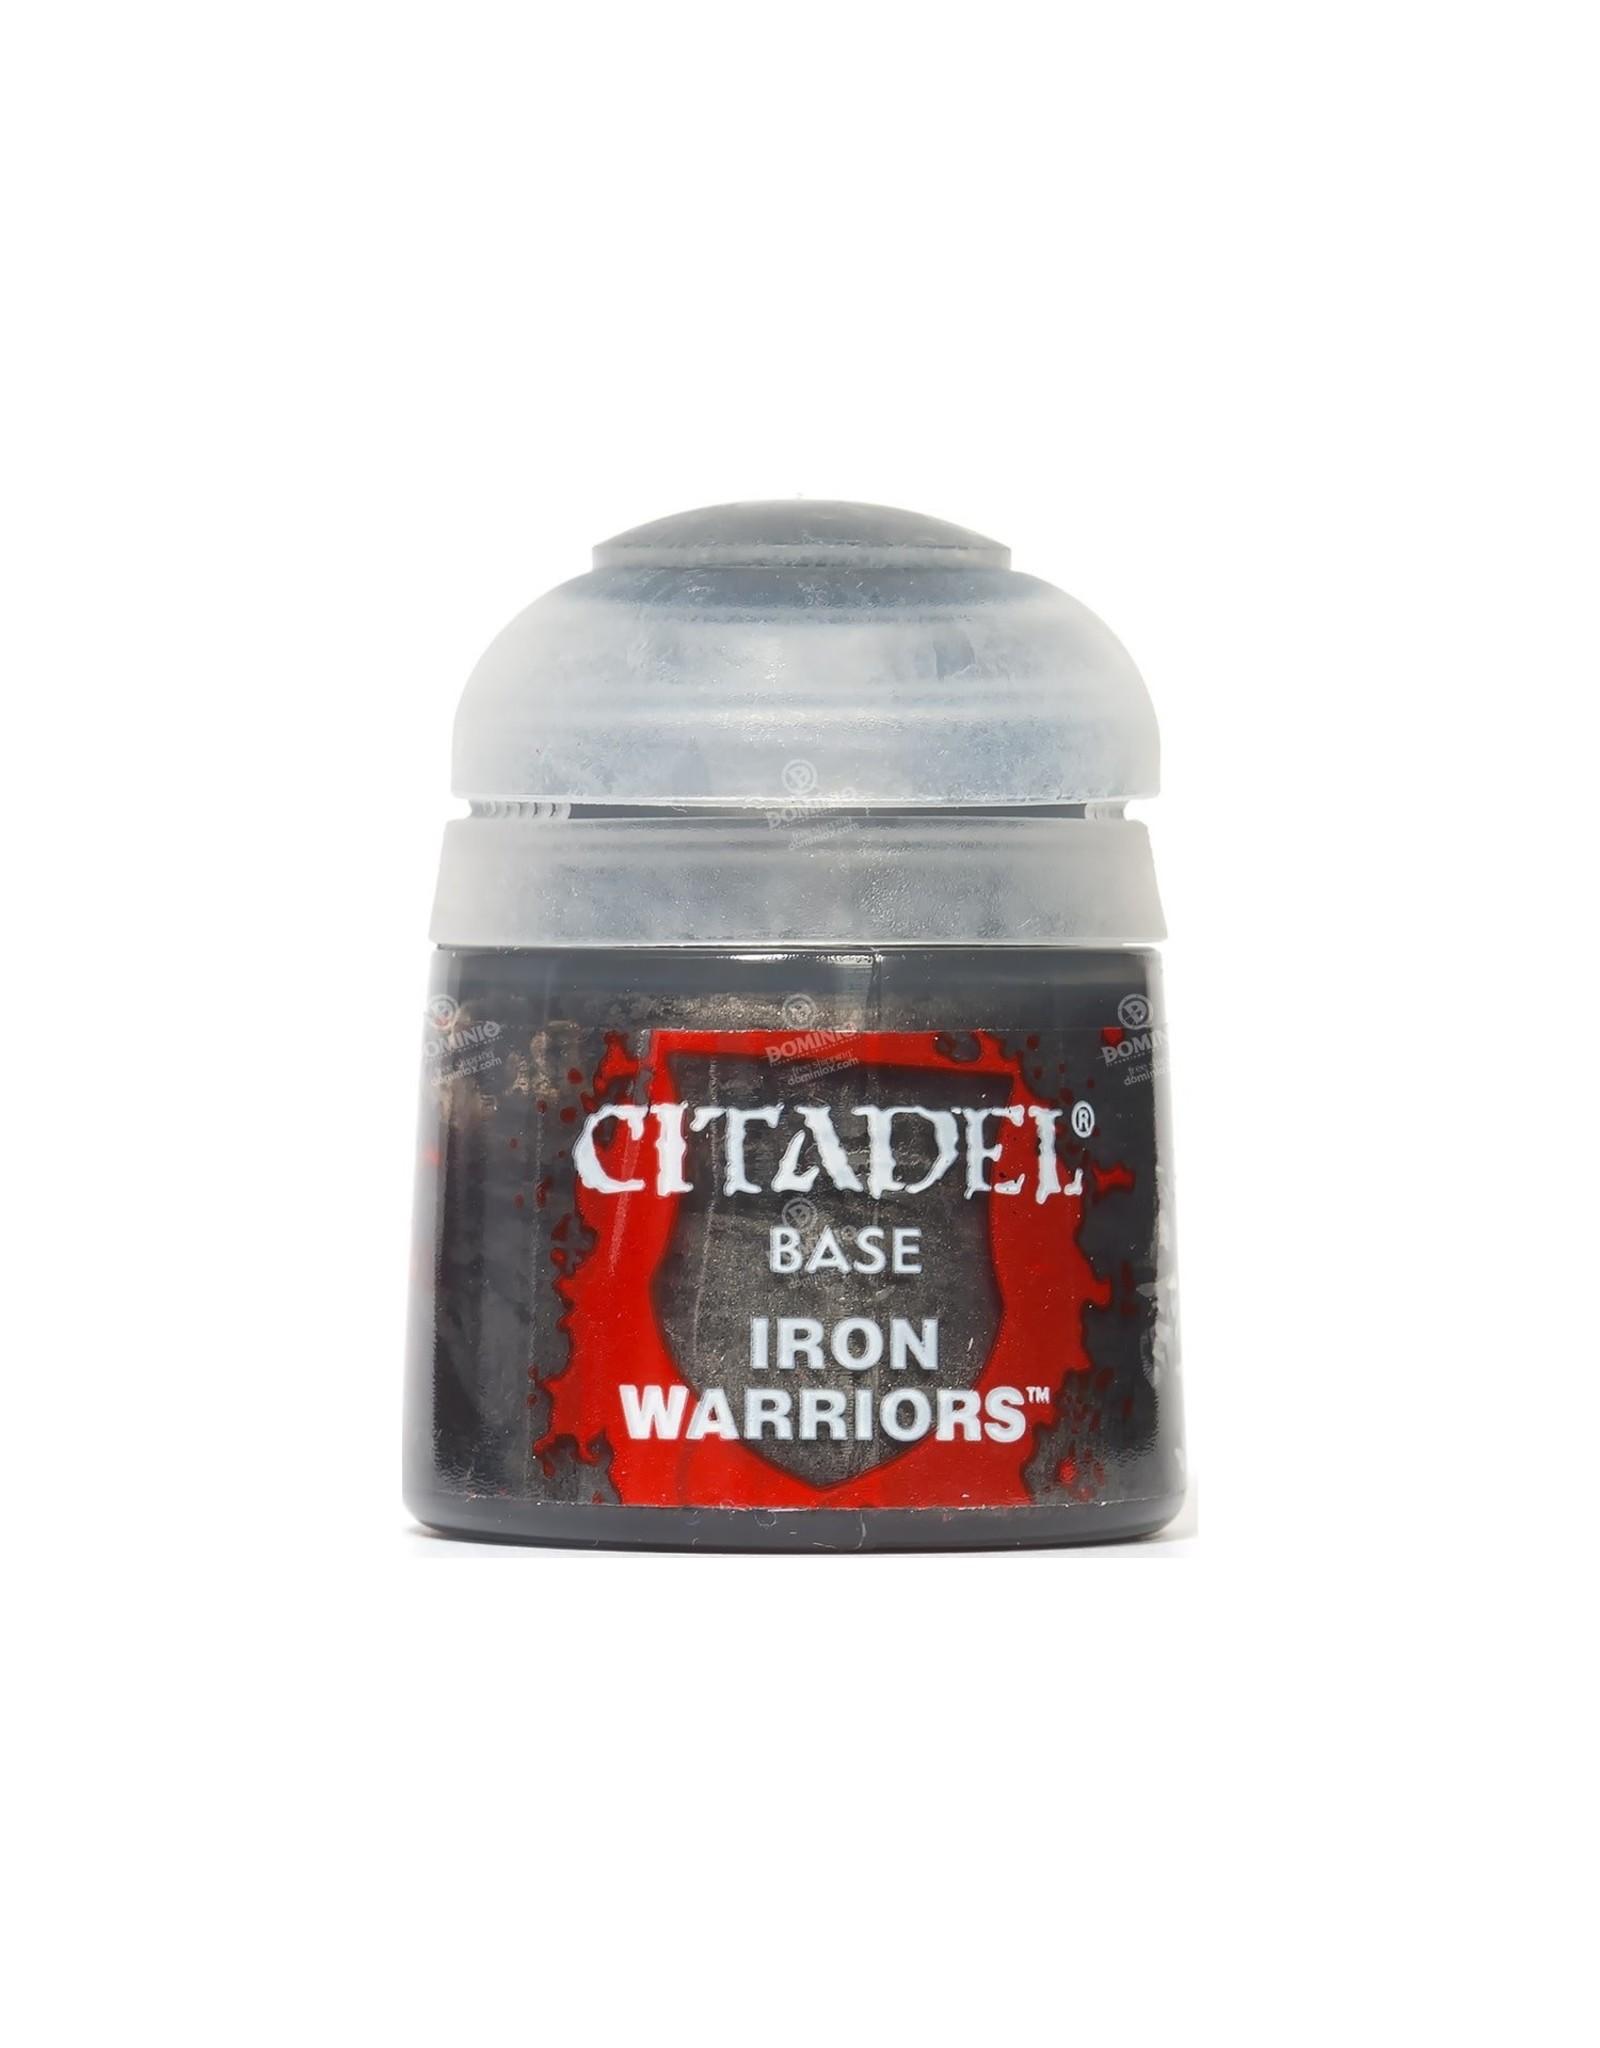 Games Workshop Citadel Paint: Iron Warriors Base 12 ml